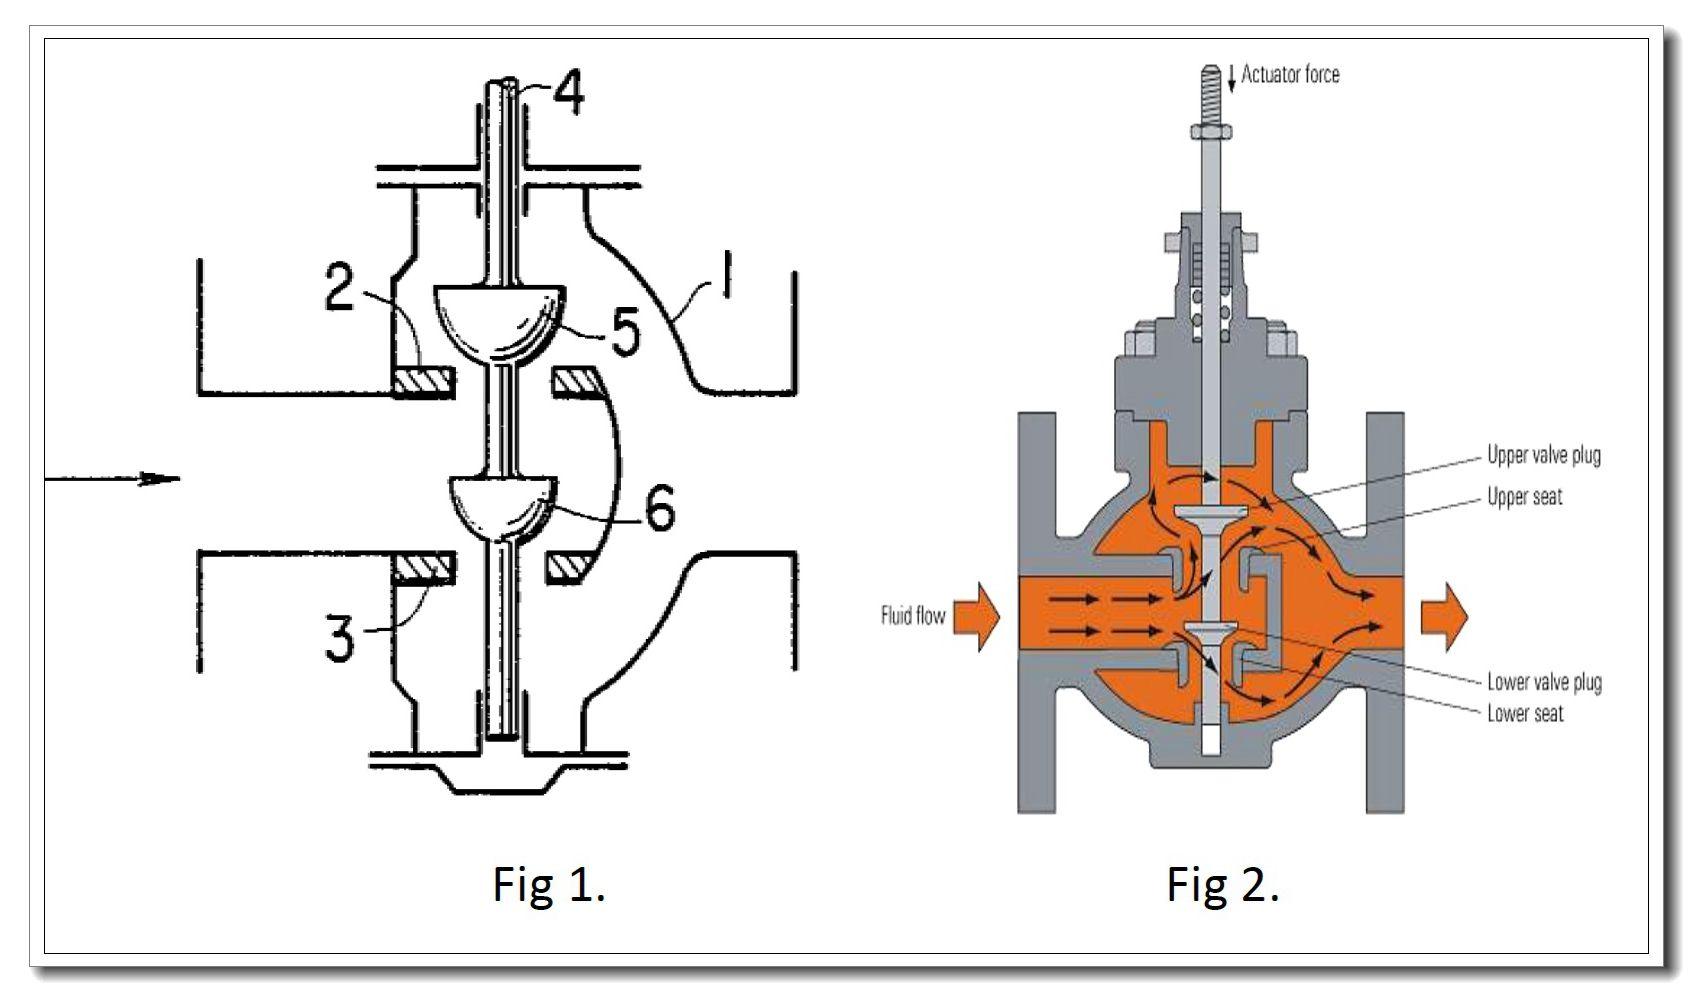 hight resolution of double valve diagram wiring diagram new double acting solenoid valve diagram double seat gate valve sjd susan